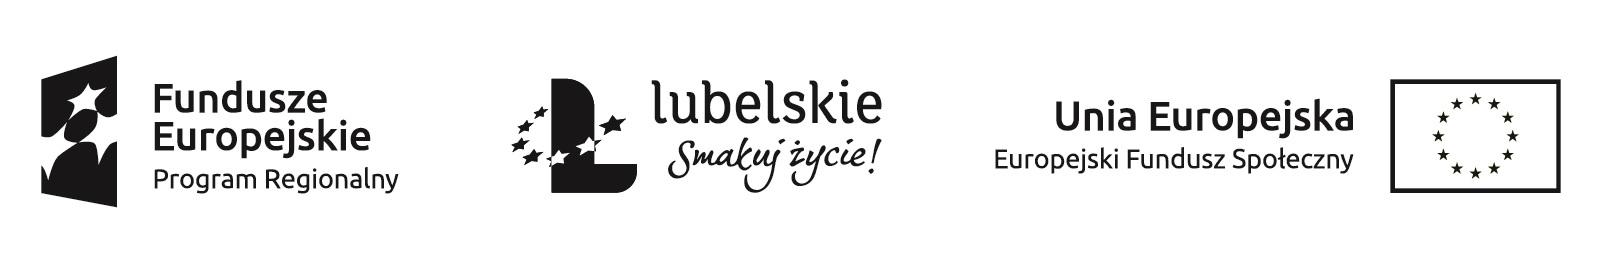 logo_ue_lubelskie_cb